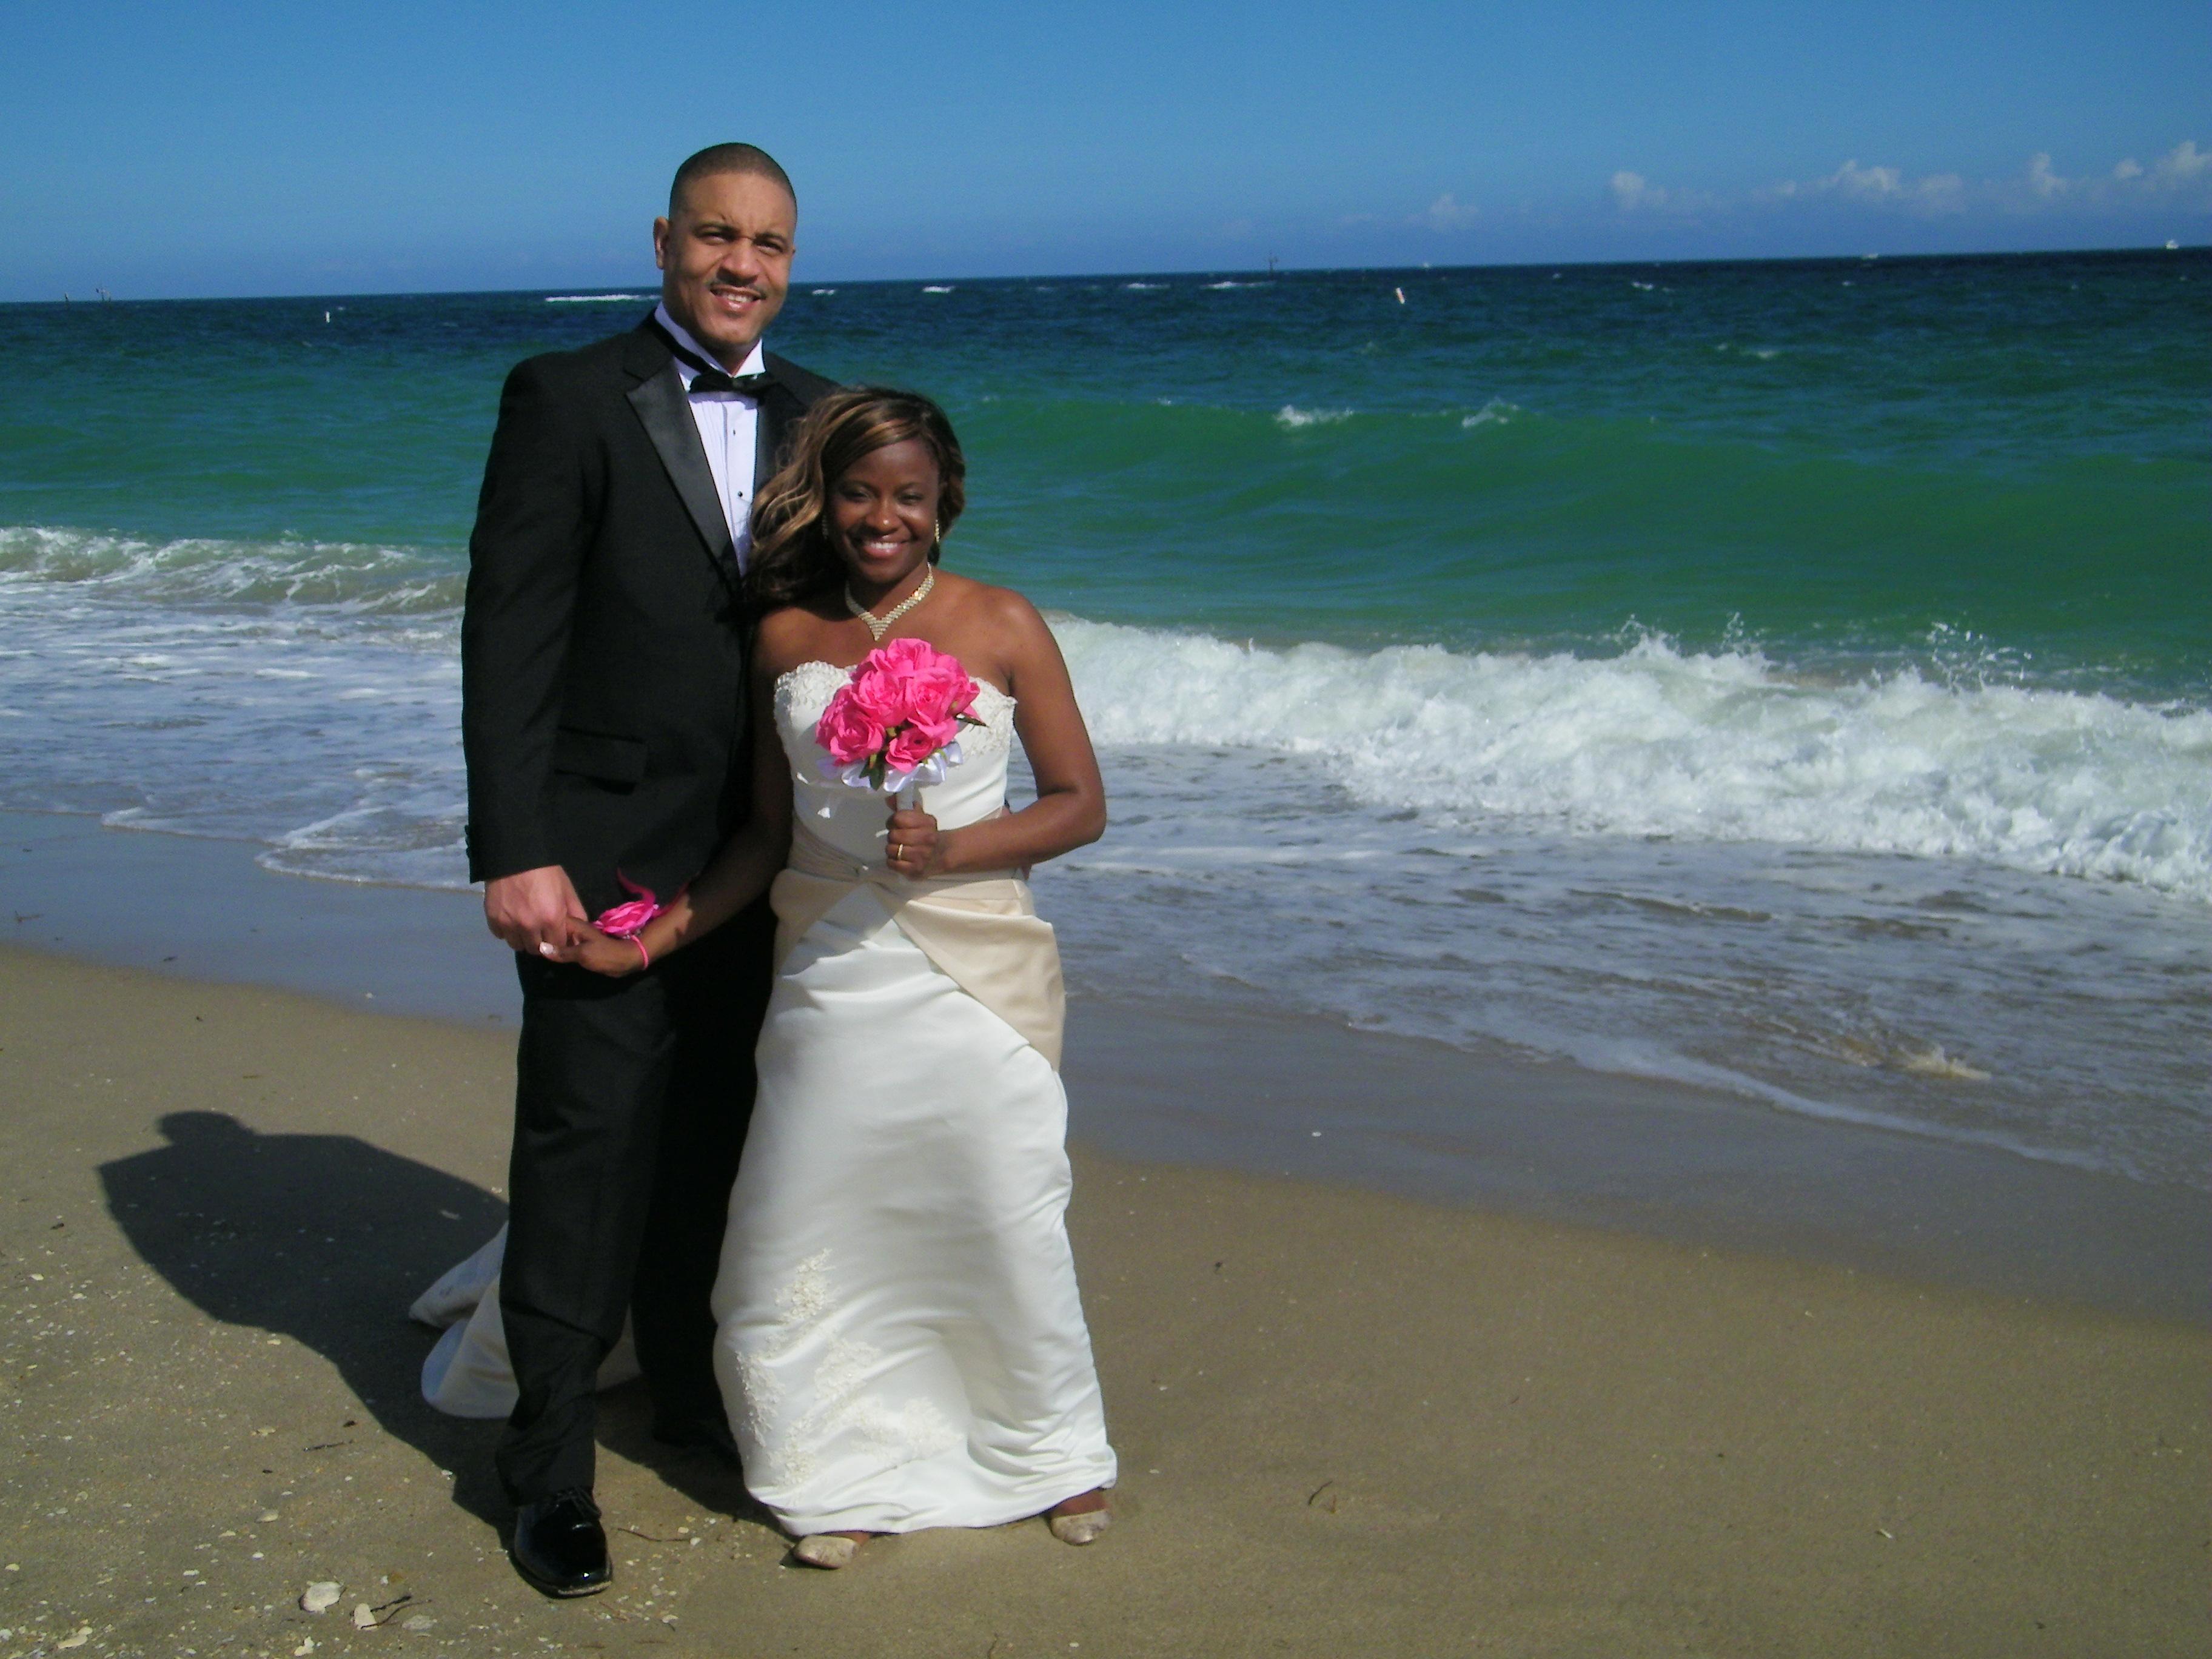 pompano beach bride groom wedding